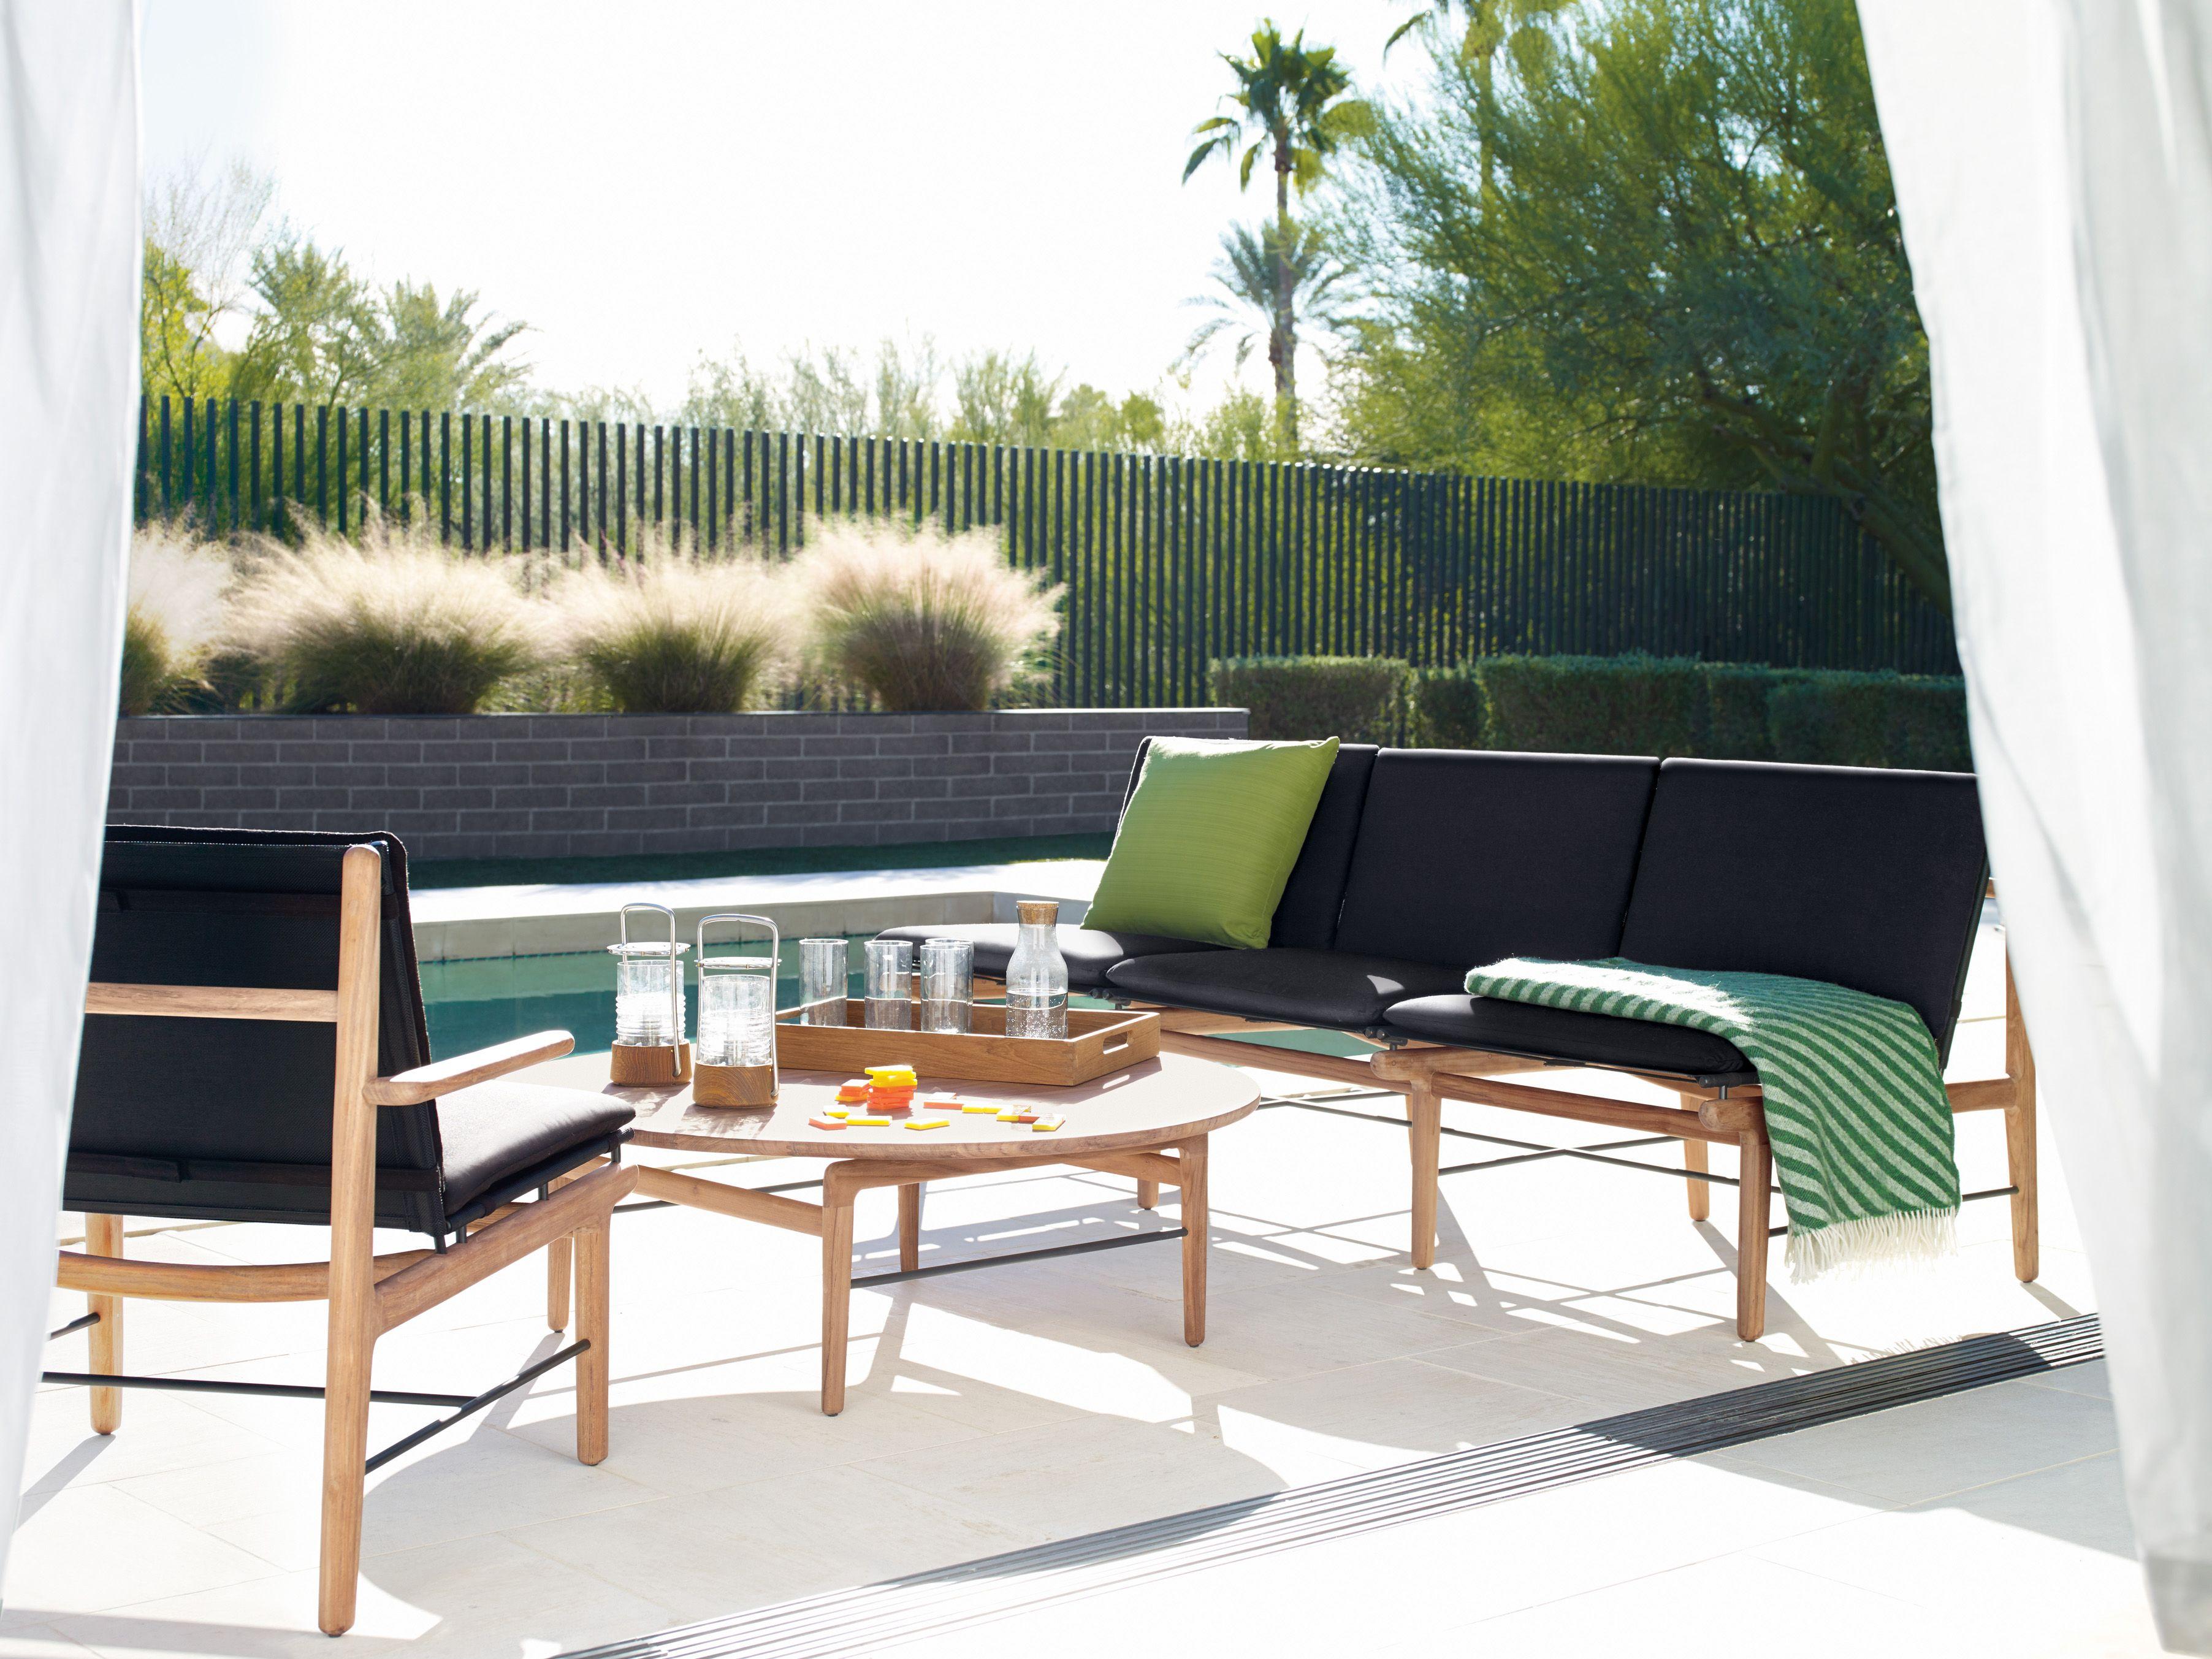 create a backyard escape finn outdoor collection designed by